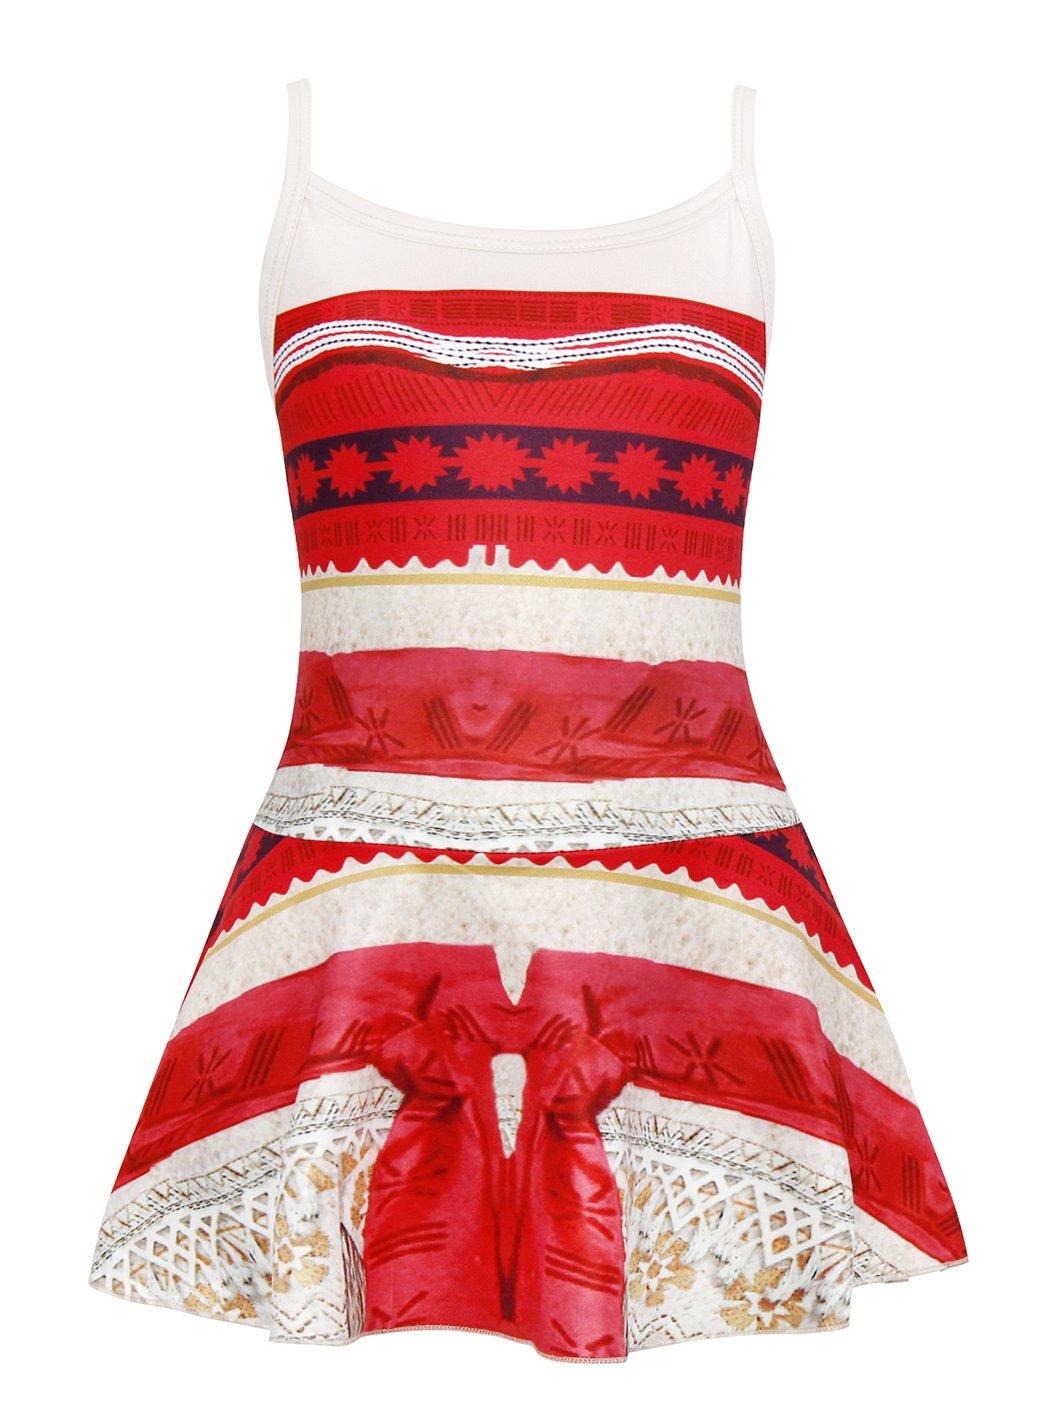 Cotrio Summer Princess Moana Swimsuit Little Girls Swimwear One-Piece Beach Bathing Suit Size 6 (One-Piece Swimwear)